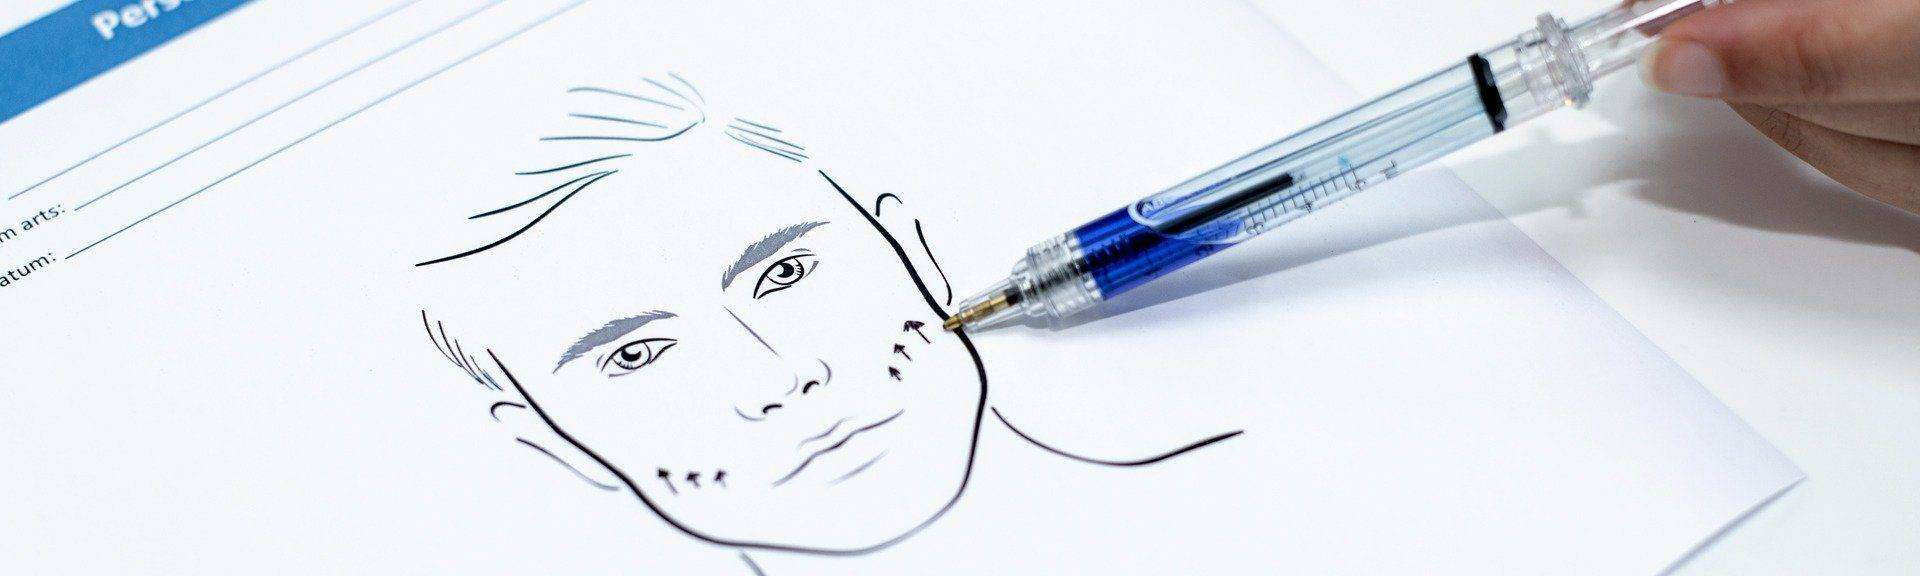 behandelingen - gezicht - facelift - minilift